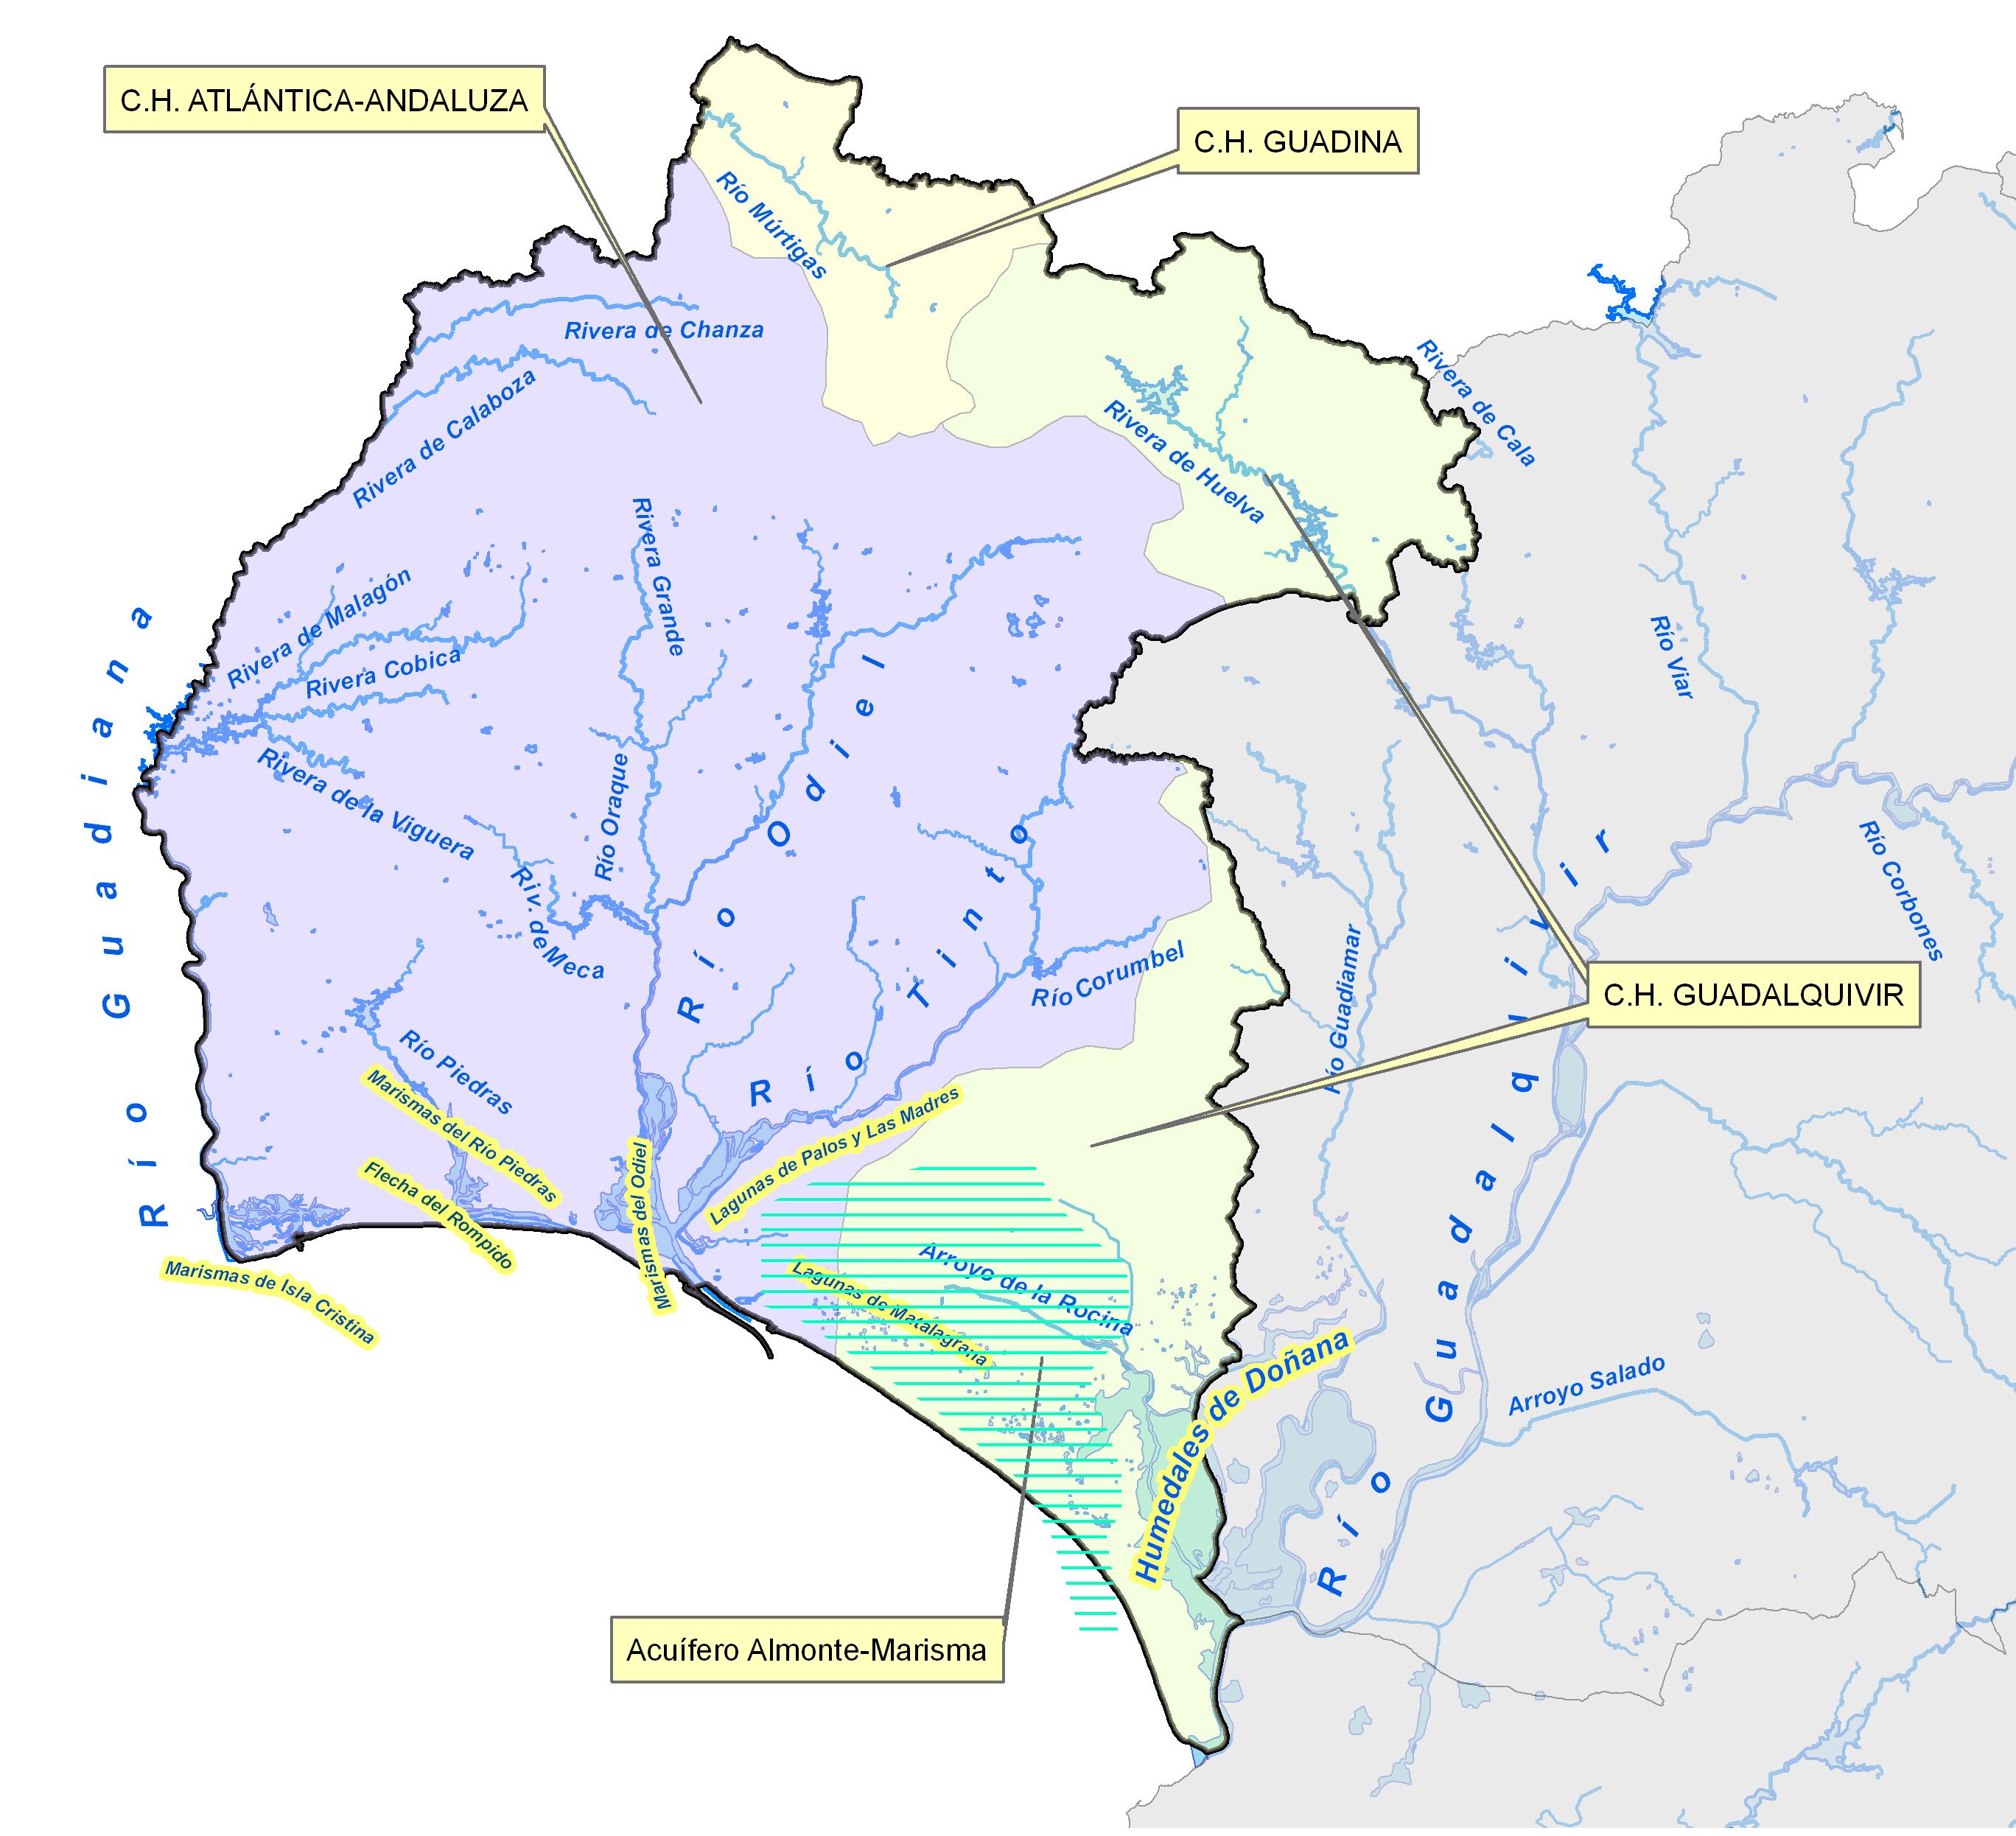 Drainage basins of the Province of Huelva 2008